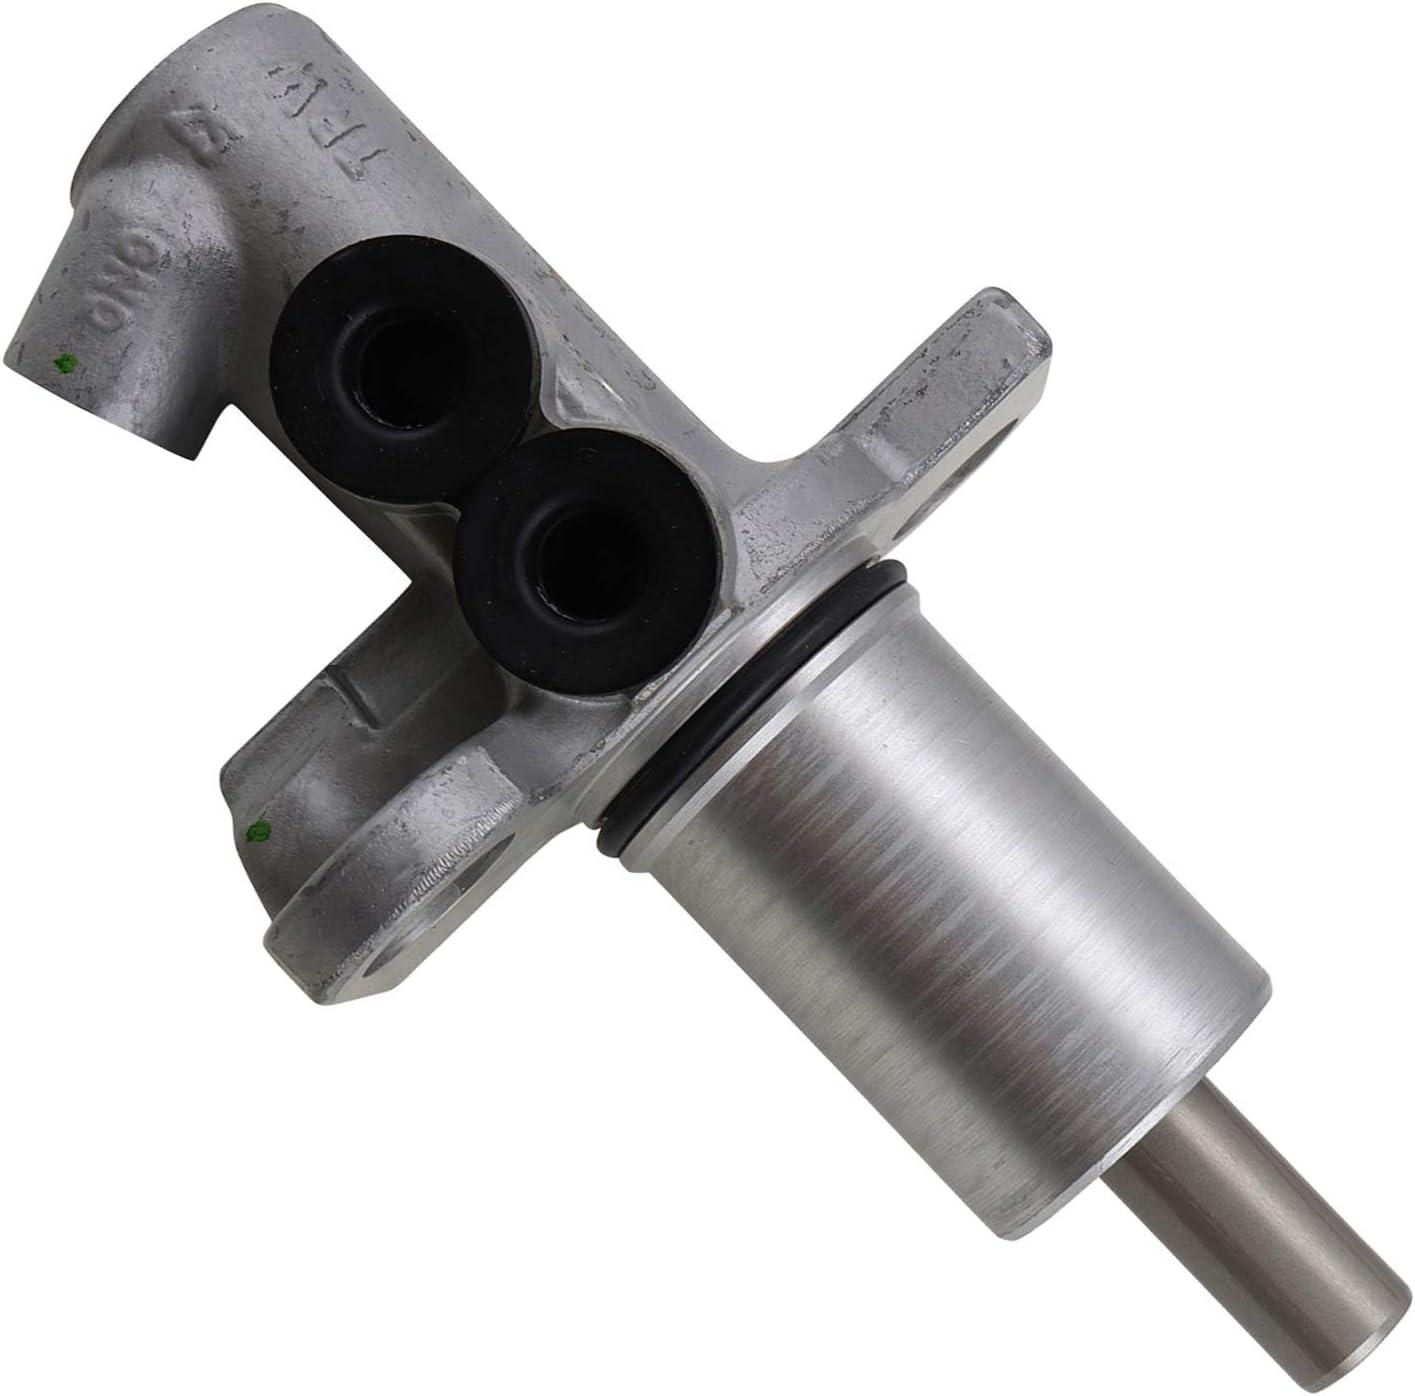 Beck Arnley 072-9672 Brake Max 51% OFF Cylinder 5 ☆ very popular Master